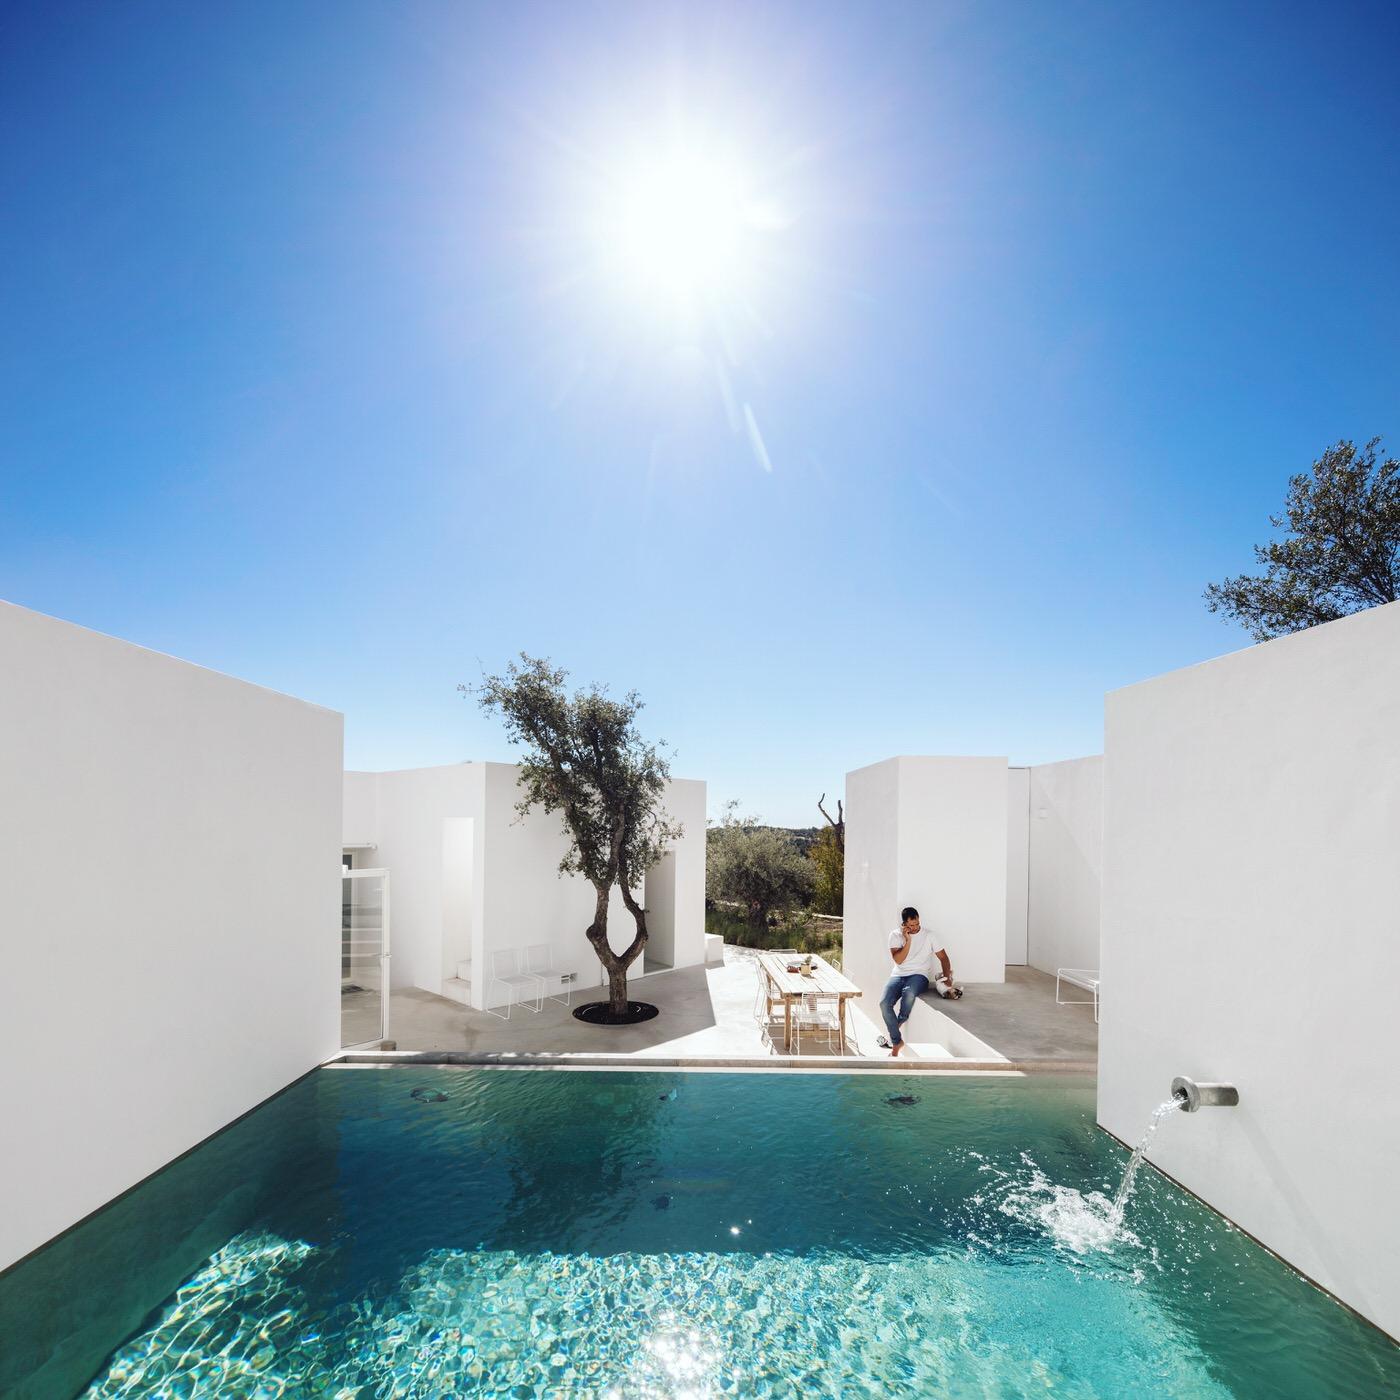 Zalig-Algarve-Casa-Luum-173-1